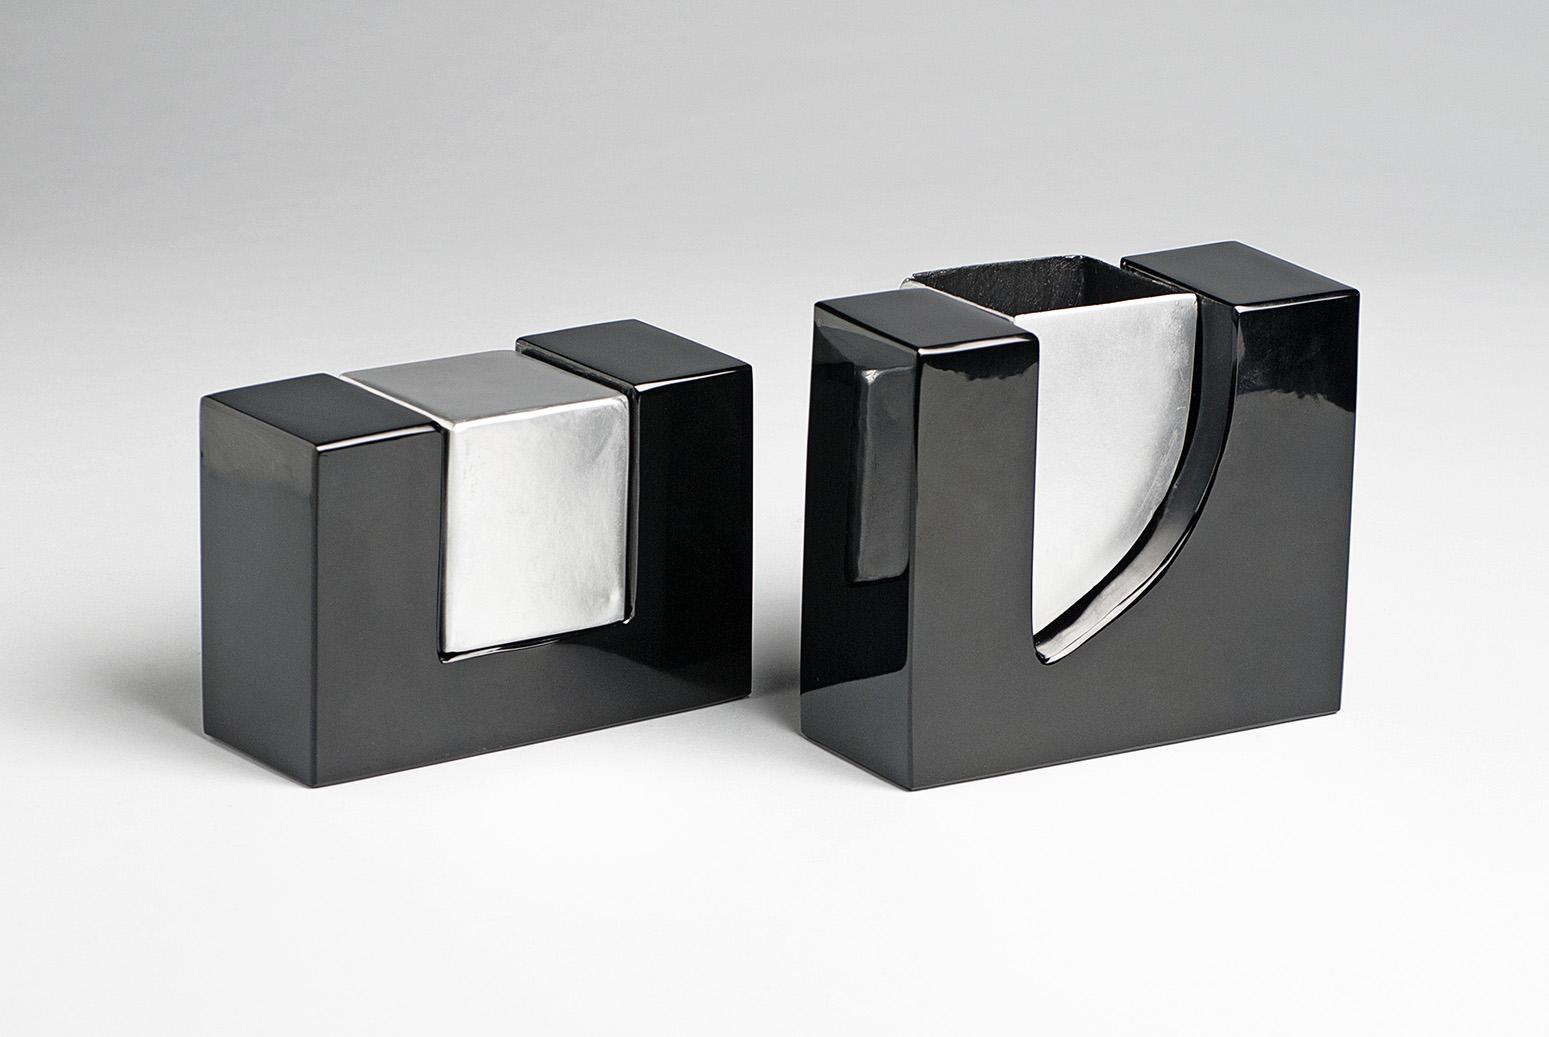 Osidian-bathroom-accessory-designer-Sharon Moussan-artisan-Mario Sandoval-Anahuac-MarionFriedmann-MexicoDesignTime18.jpg